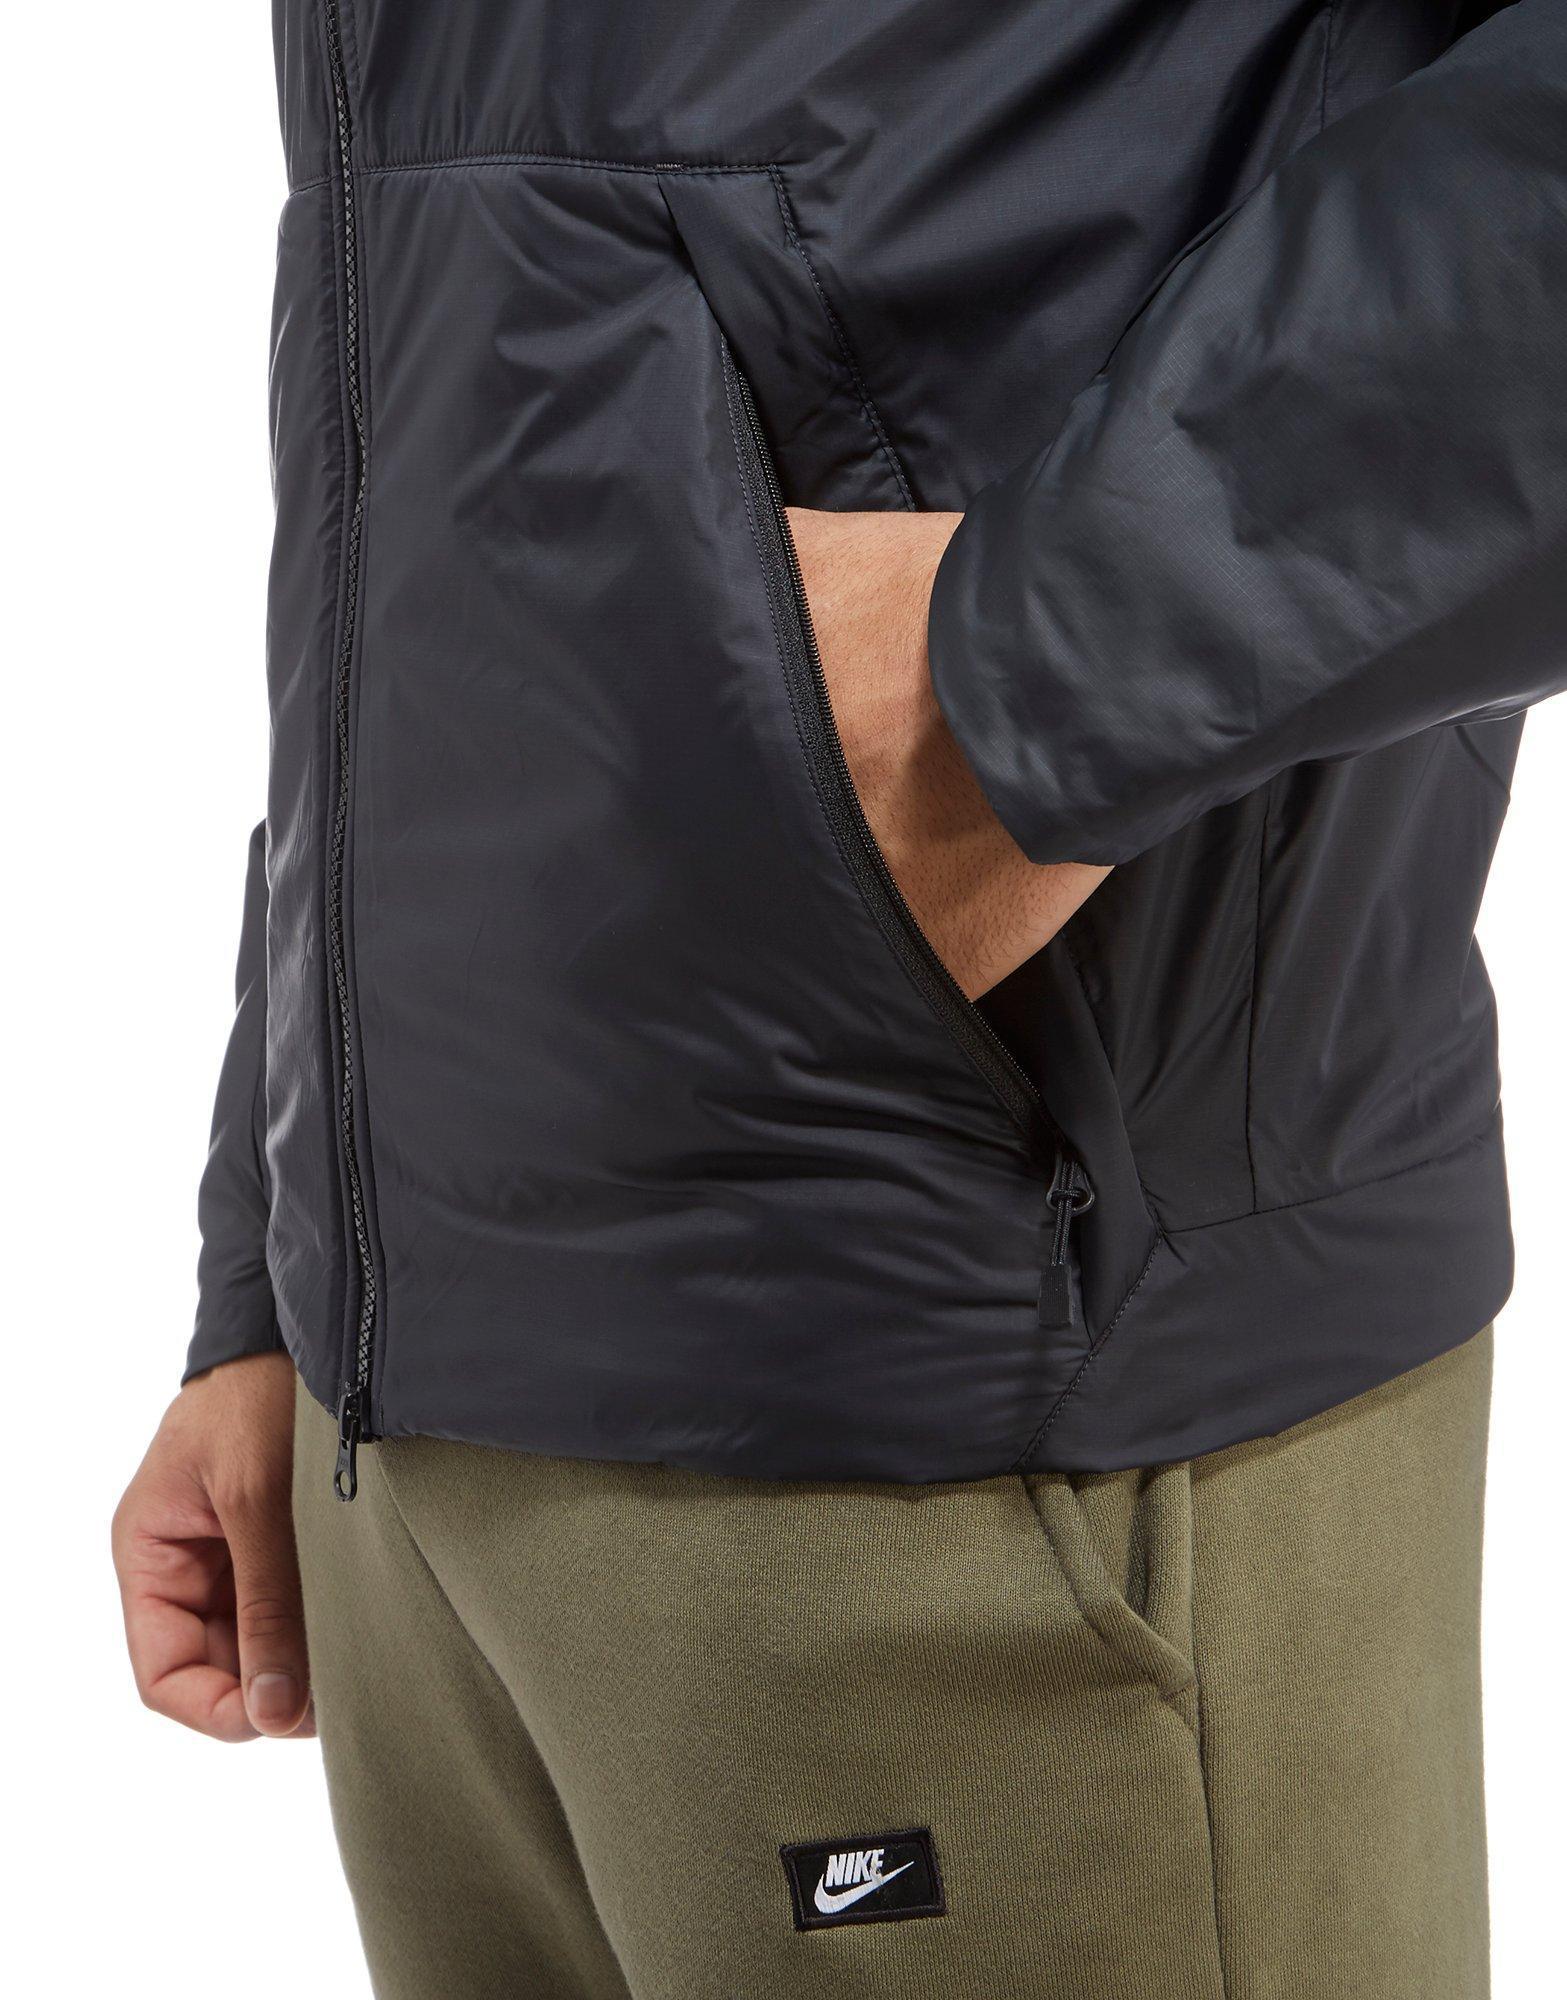 c00382e80 Nike Expel Jacket in Black for Men - Lyst